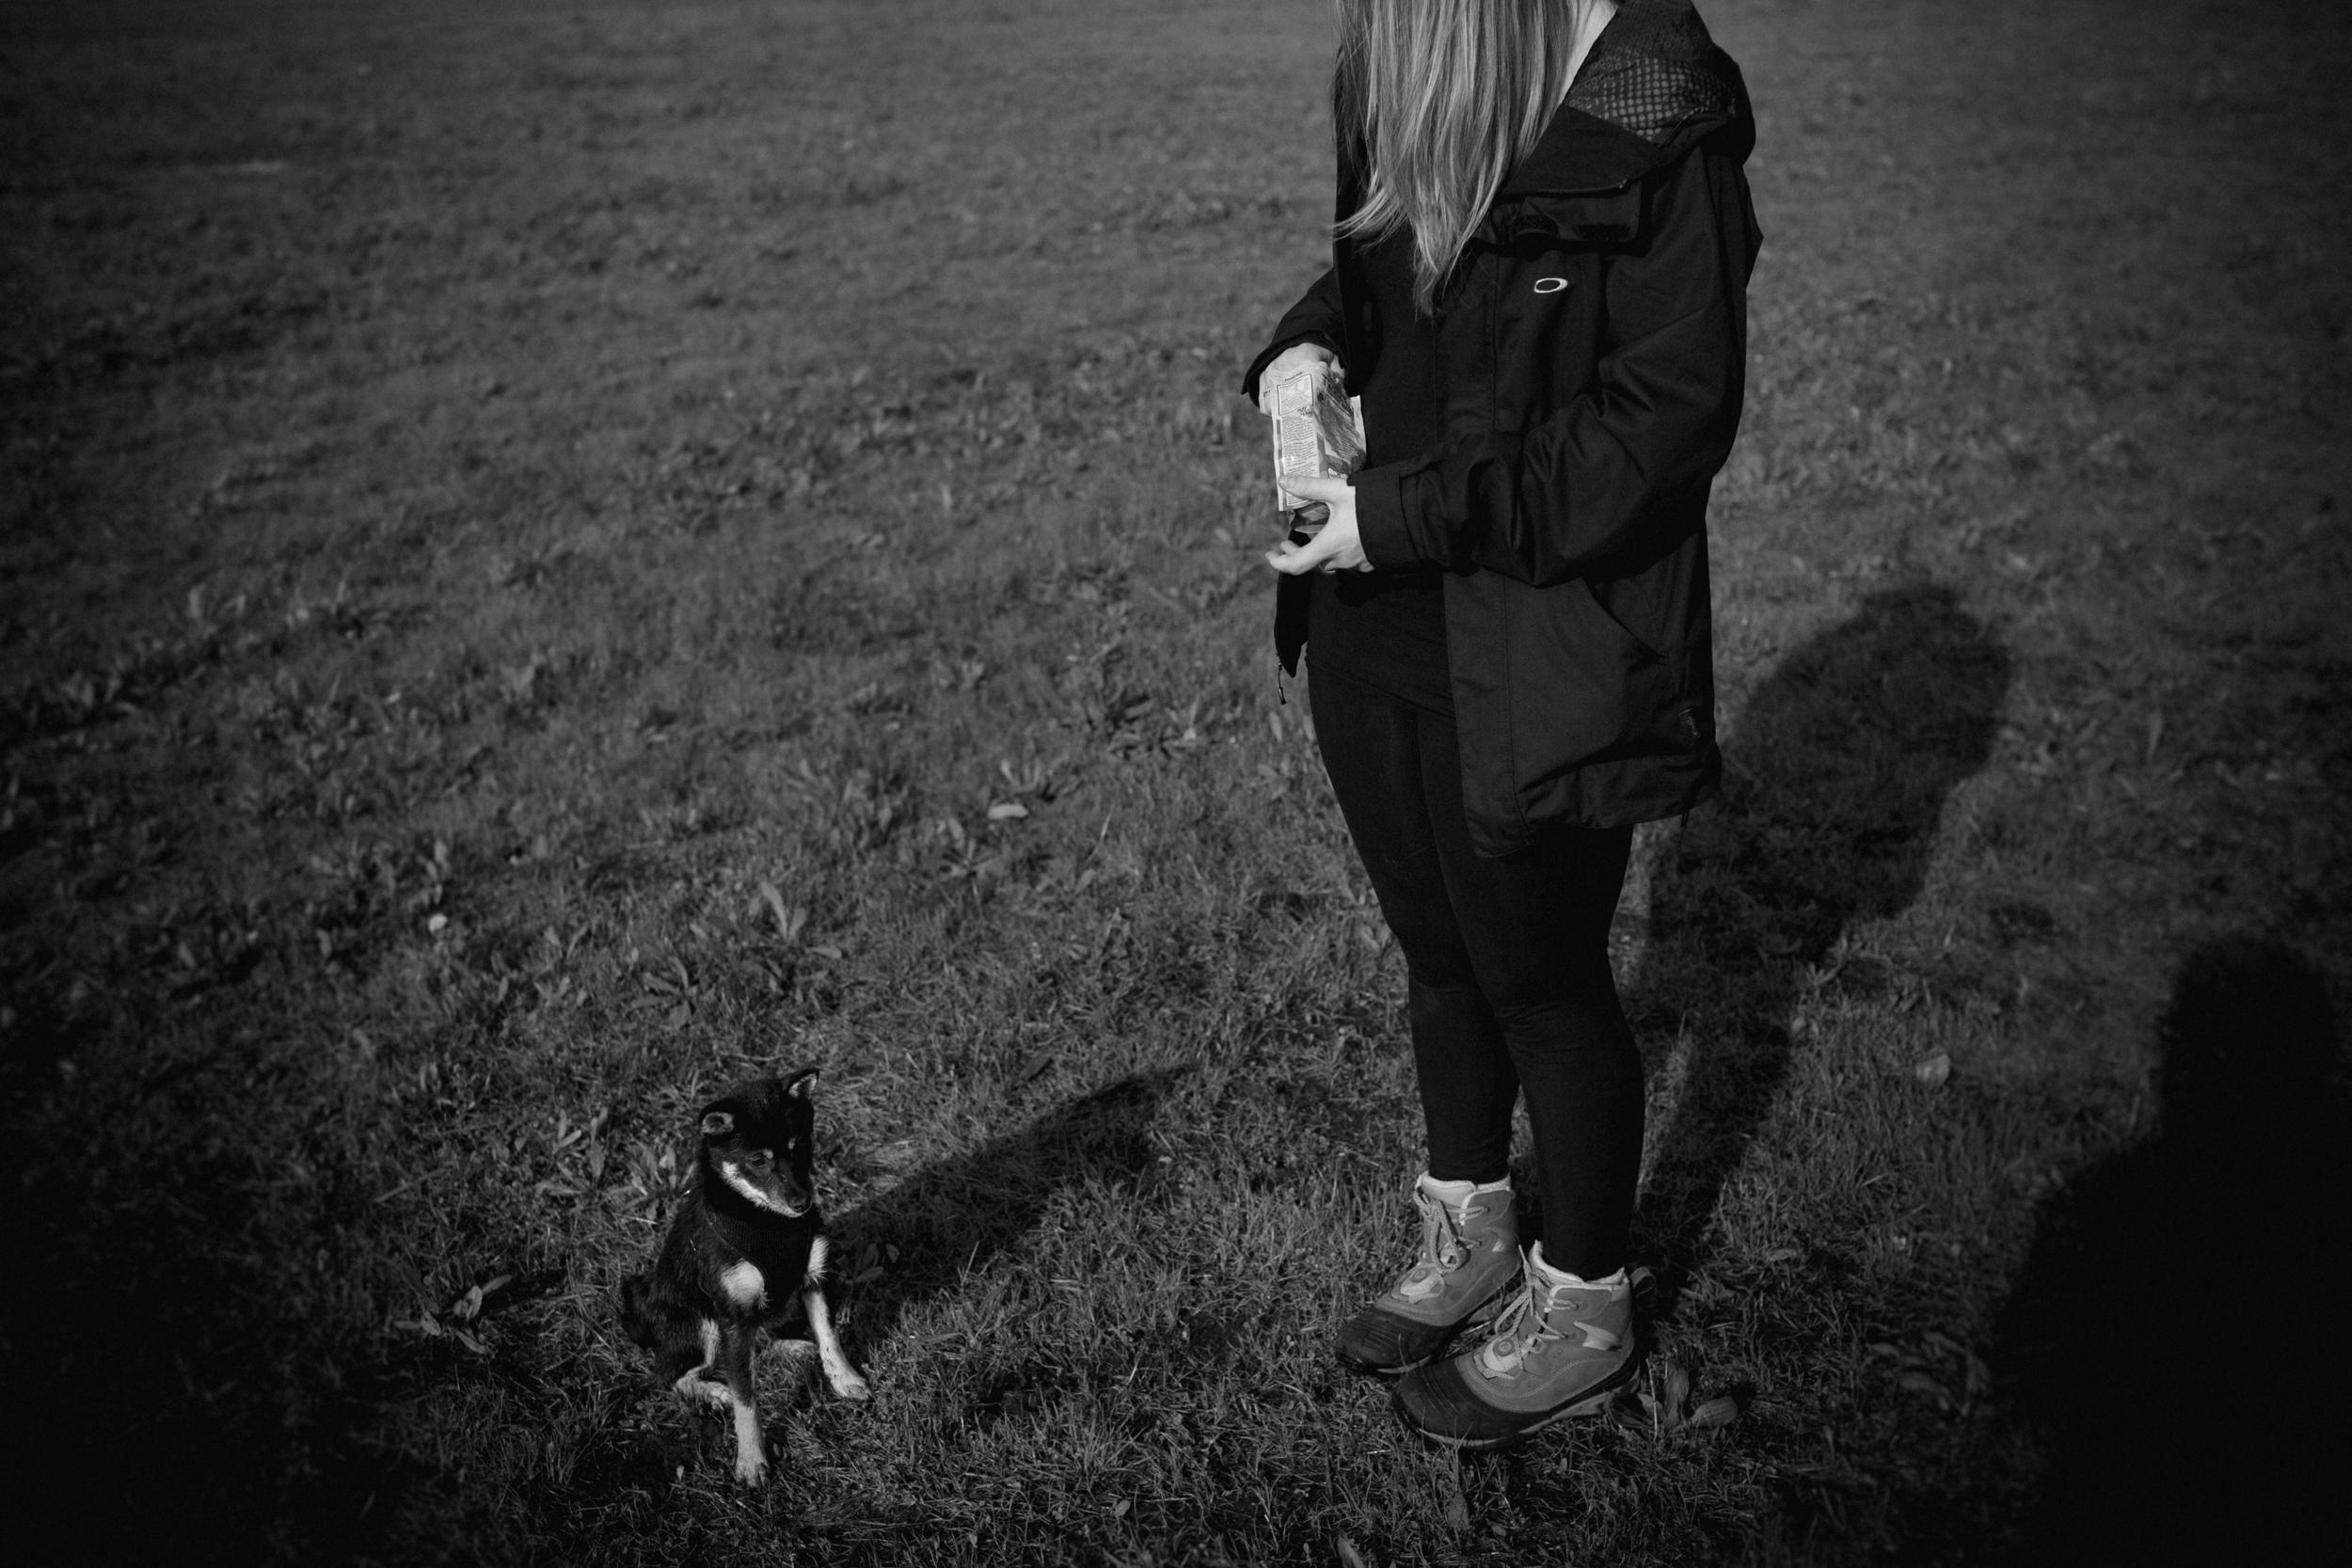 Lana&Reba-AlexLopezImgages-Persaonal_Gallery-6.jpg